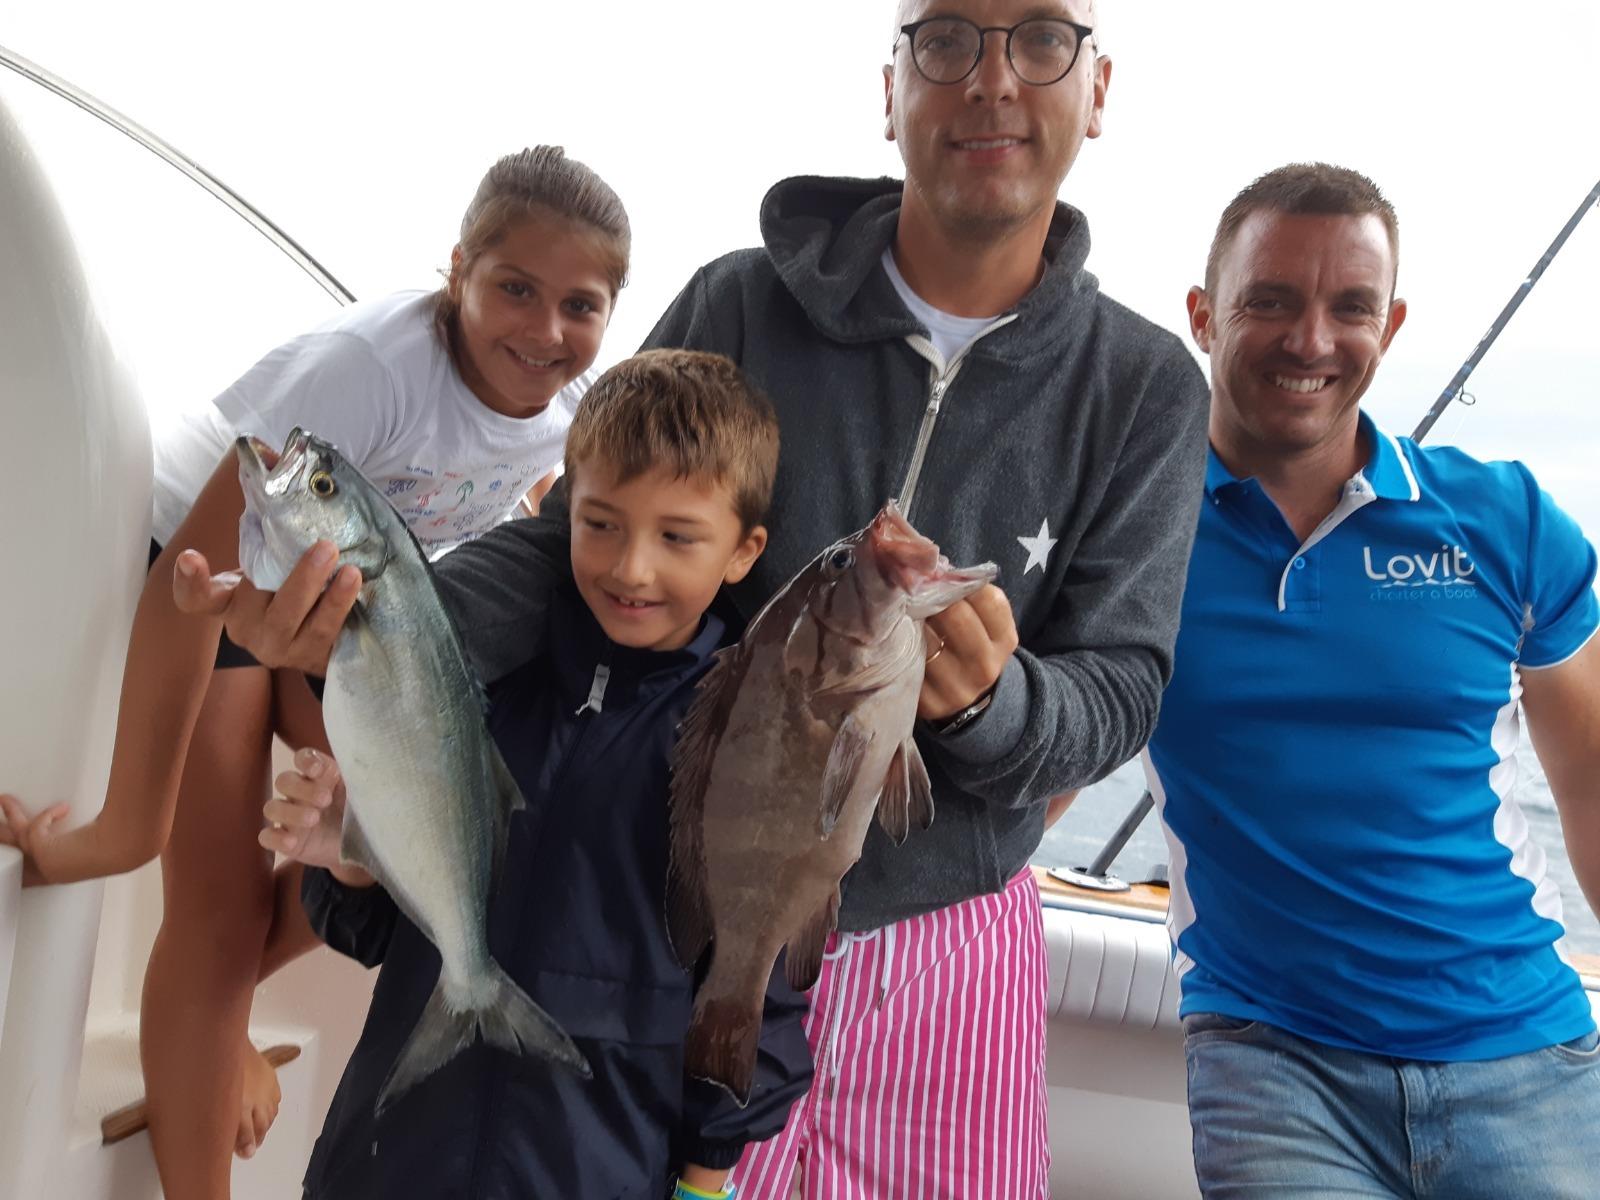 boat lovitcharter family fishing